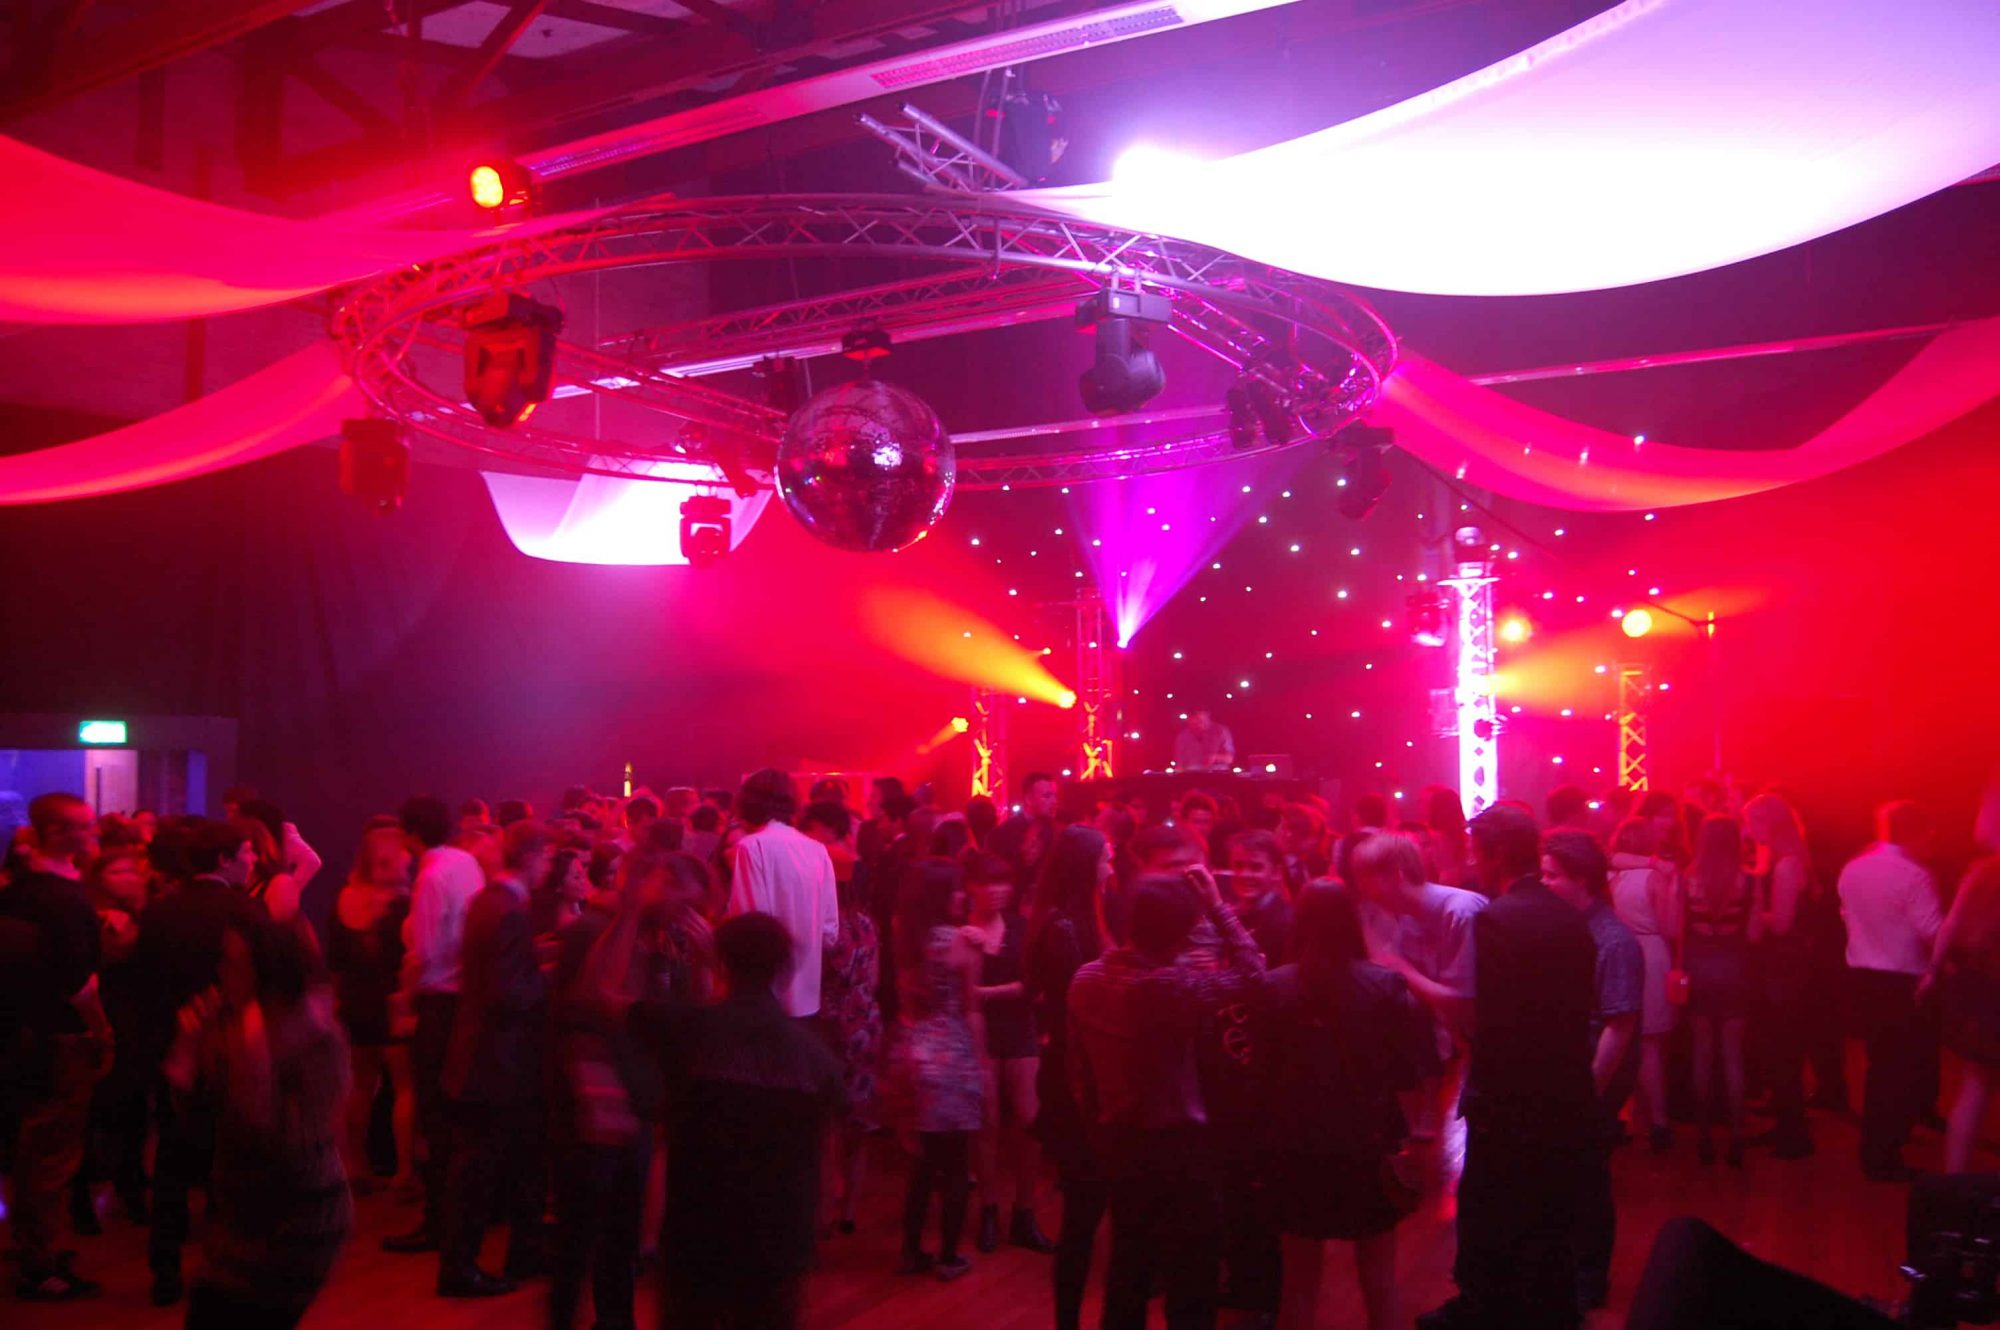 Party Lighting and AV Hire